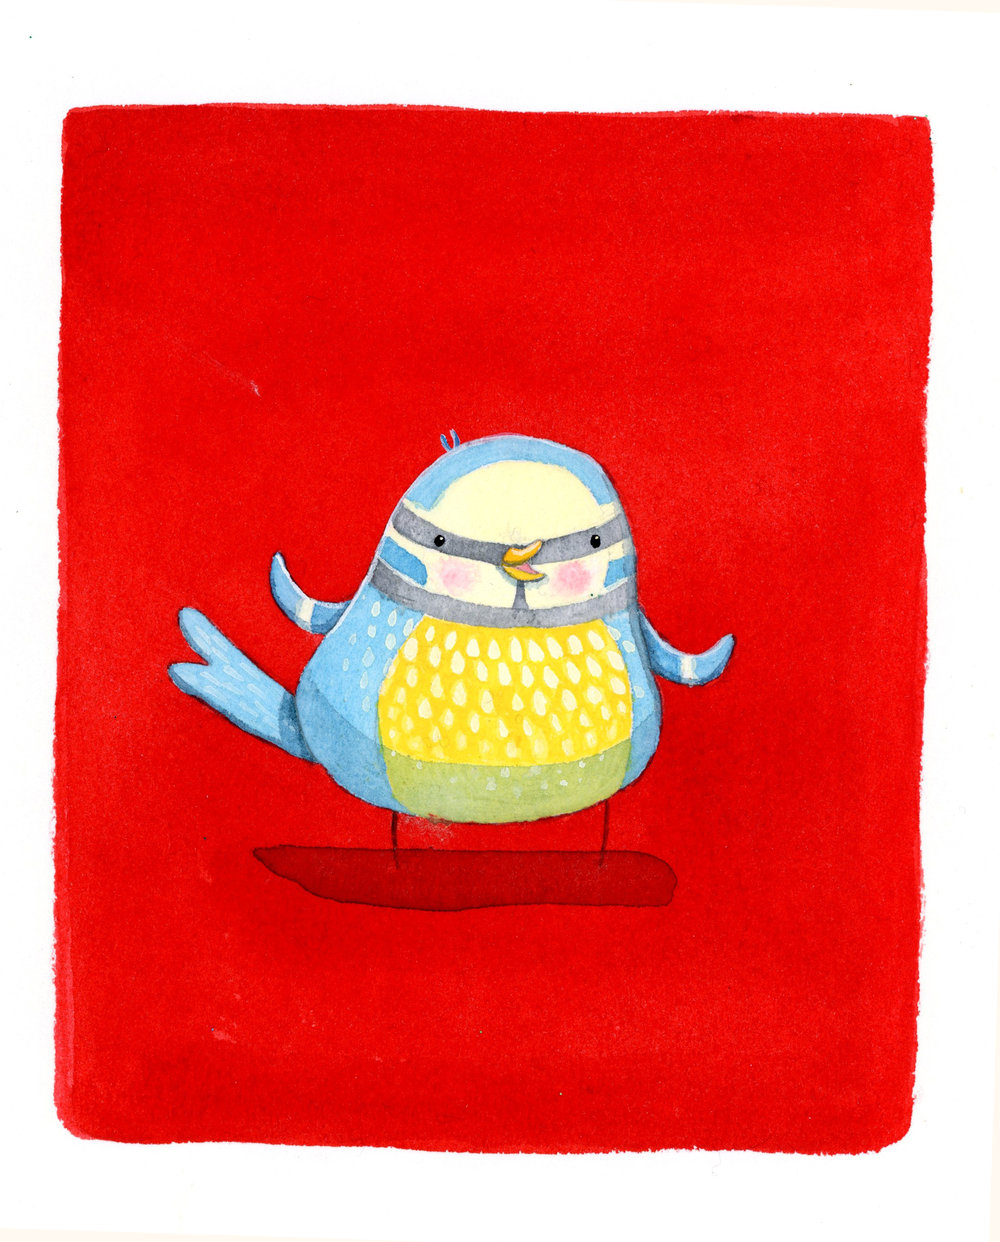 Blue_bird.jpg